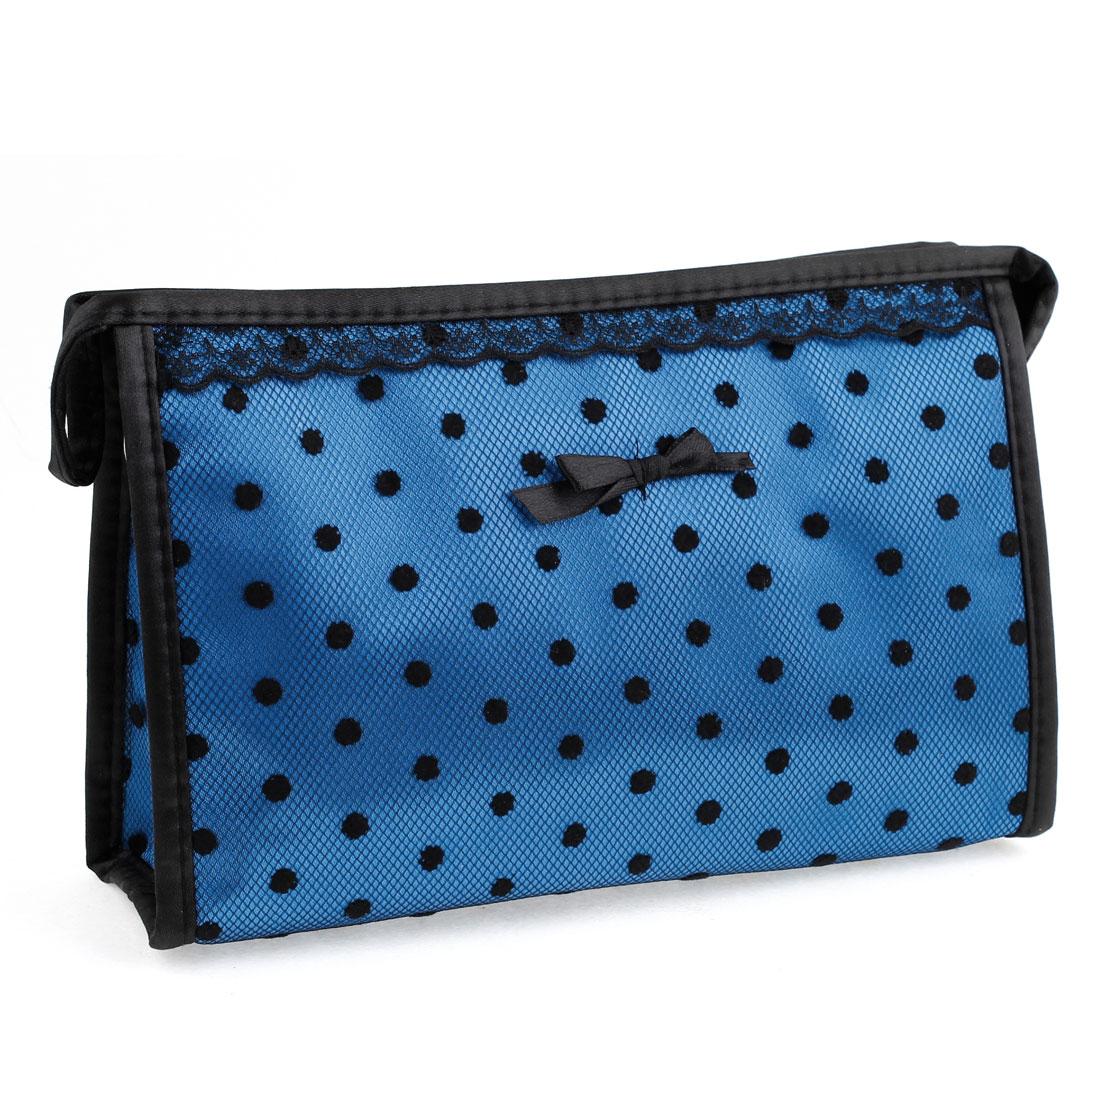 Lace Brim Meshy Dots Print Zippered Cosmetics Bag Brush Makeup Organizer Blue